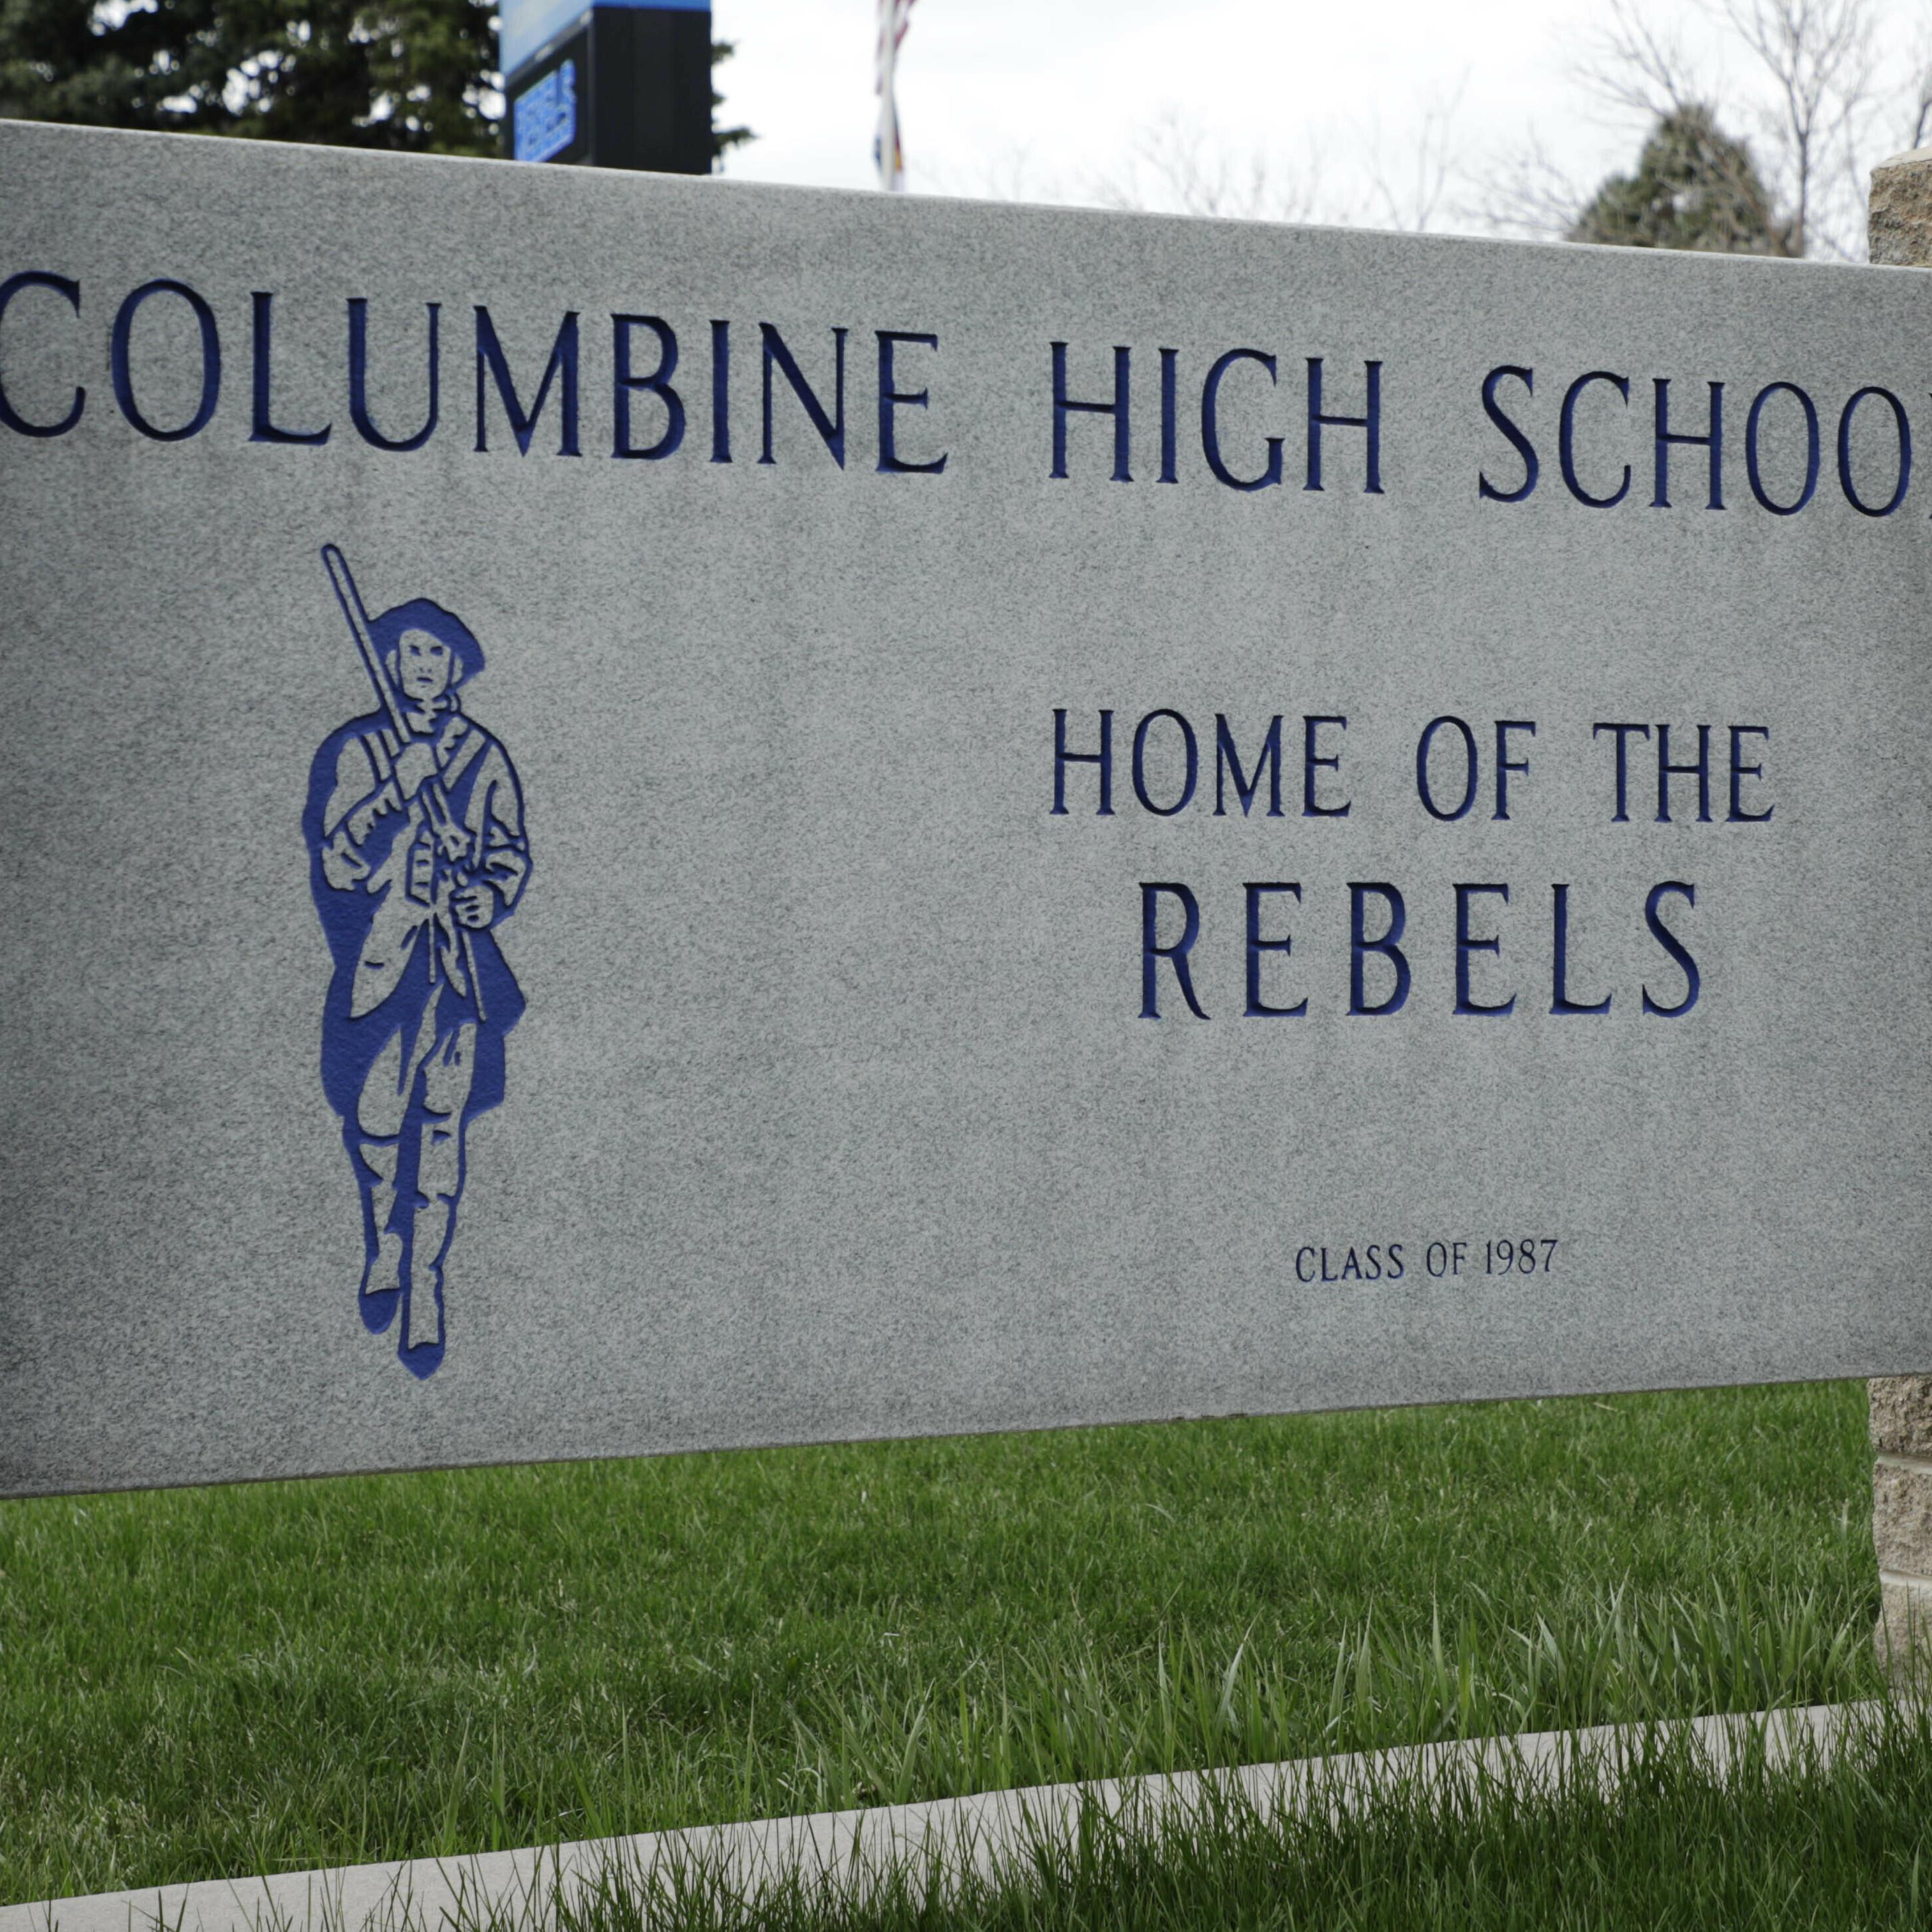 Columbine Survivors Divided Over Proposal To Demolish Site